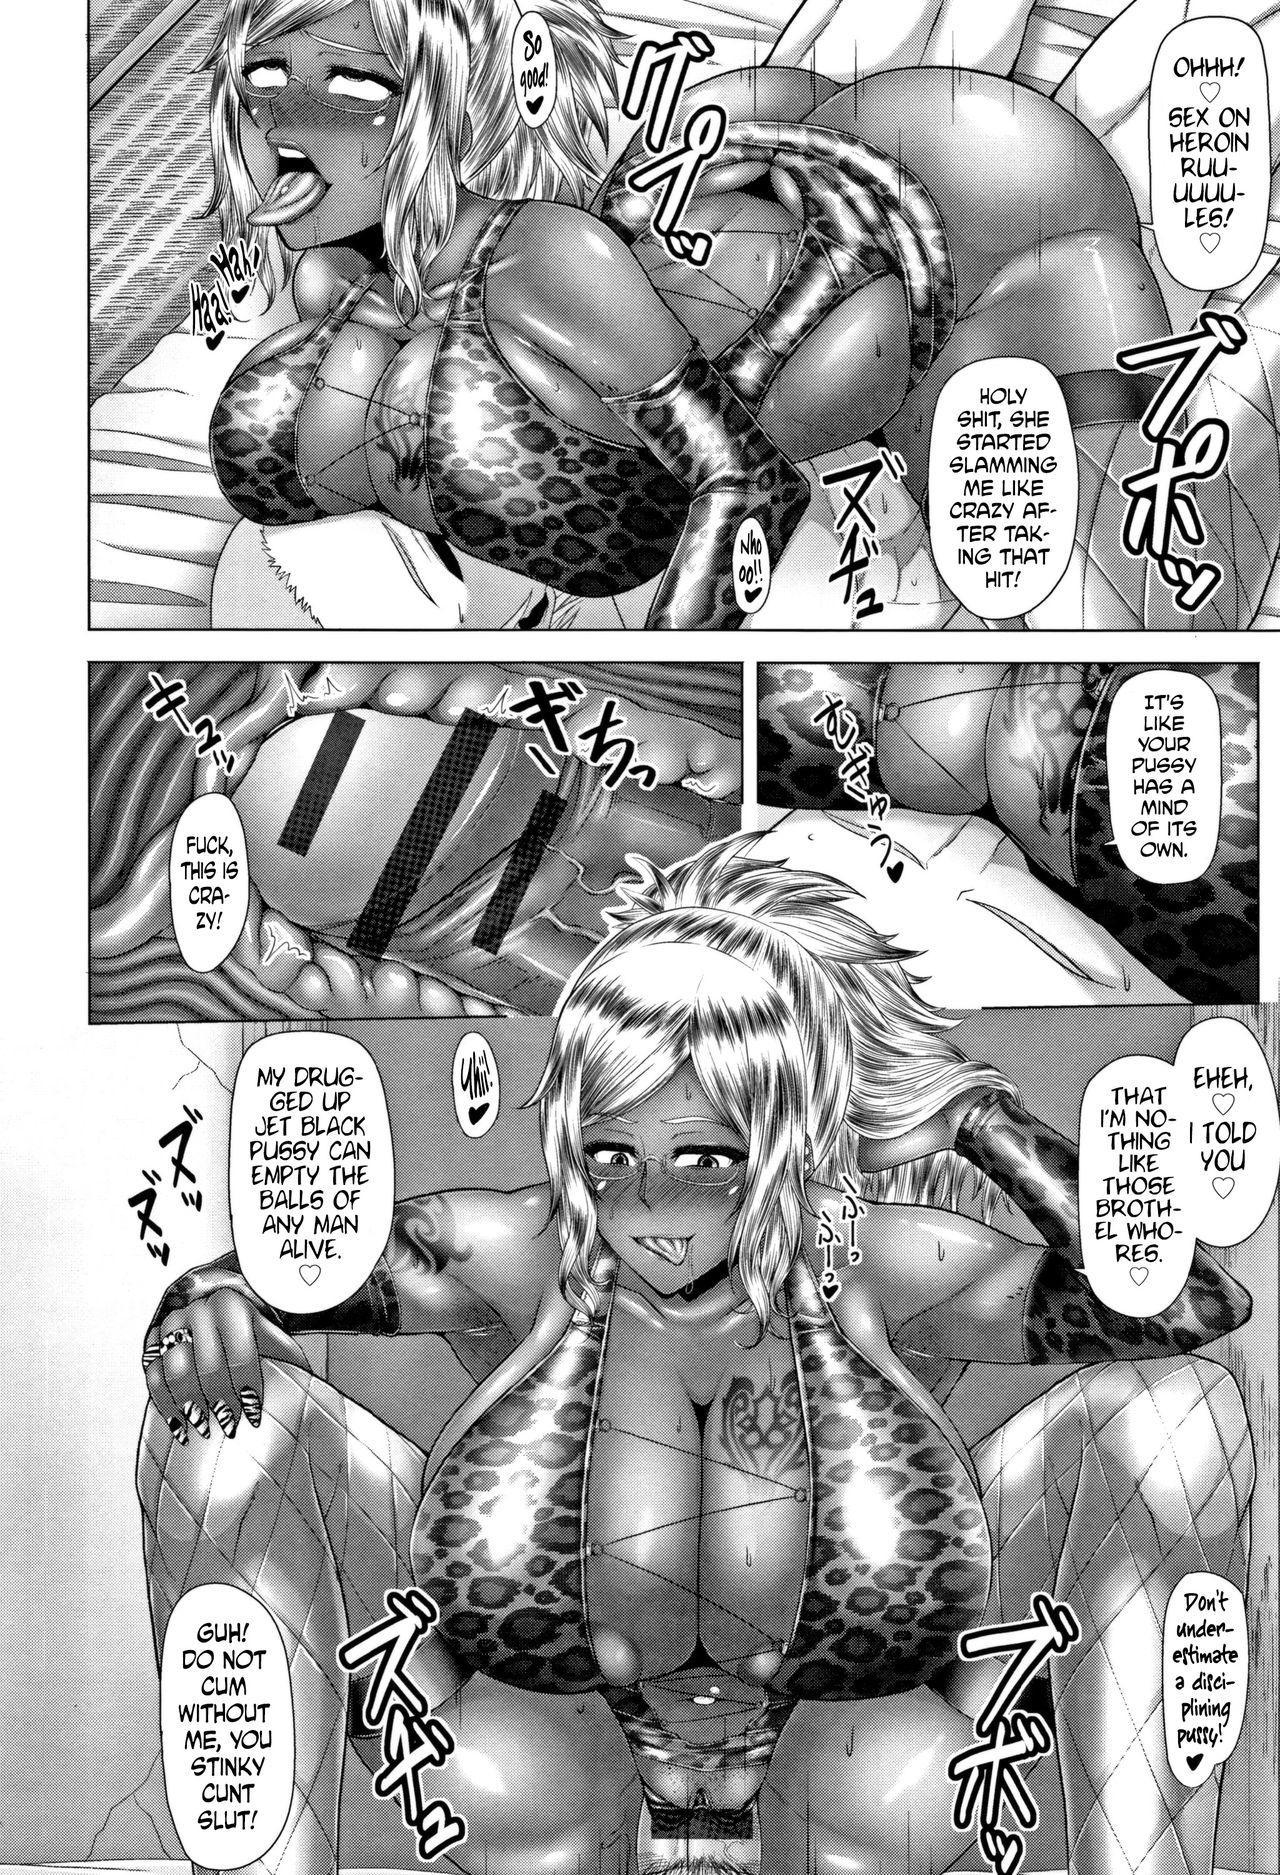 [Inoue Nanaki] Joushiki Daha! Kuro Gal Bitch-ka Seikatsu Ch. 1-3, 5-8 [English] [Dark Mac + N04h] 143